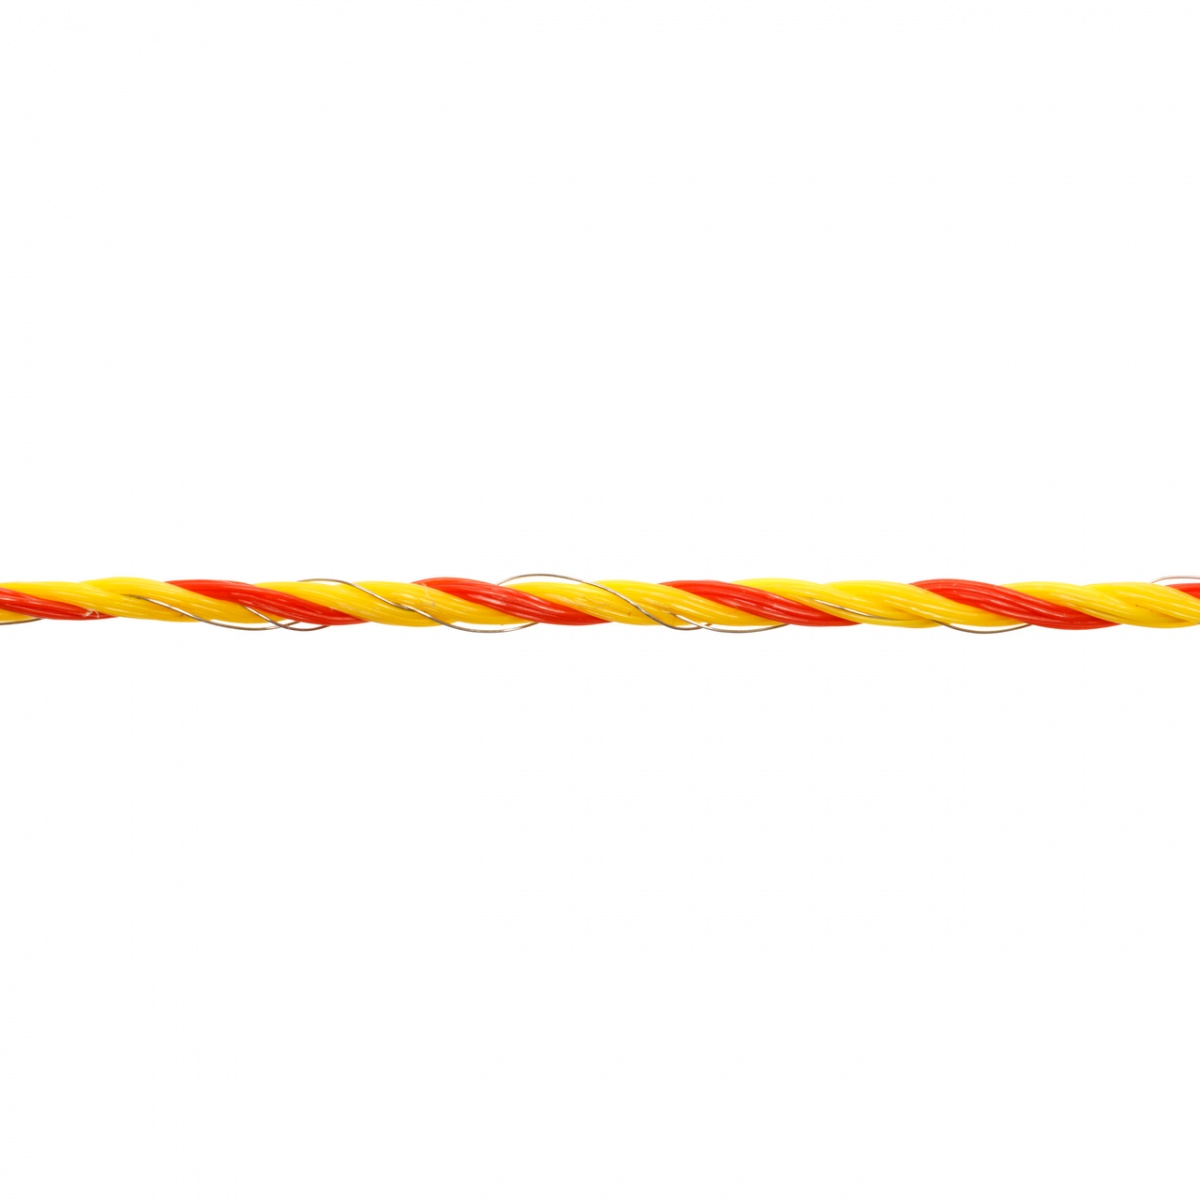 Villanypásztor zsinór - 250m - 90kg - 7,74Ω/m